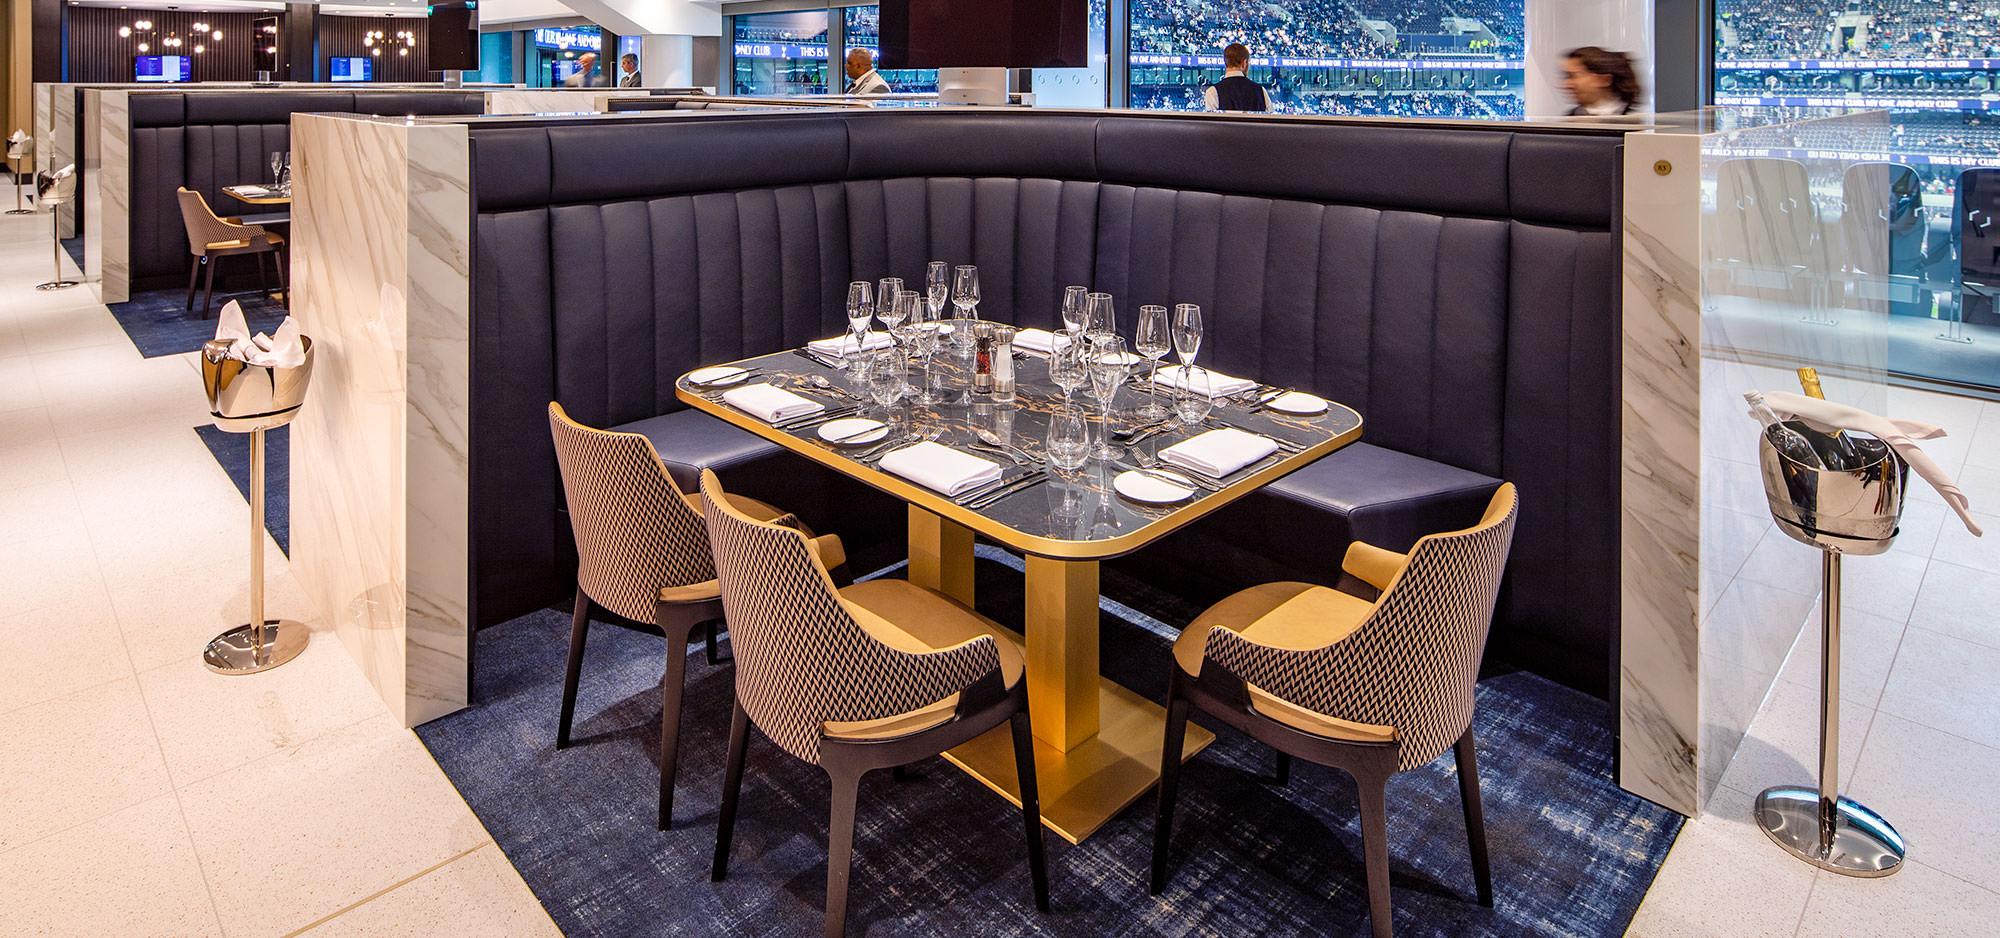 Tottenham Football Club hospitality custom leather upholstery by Margan Ltd